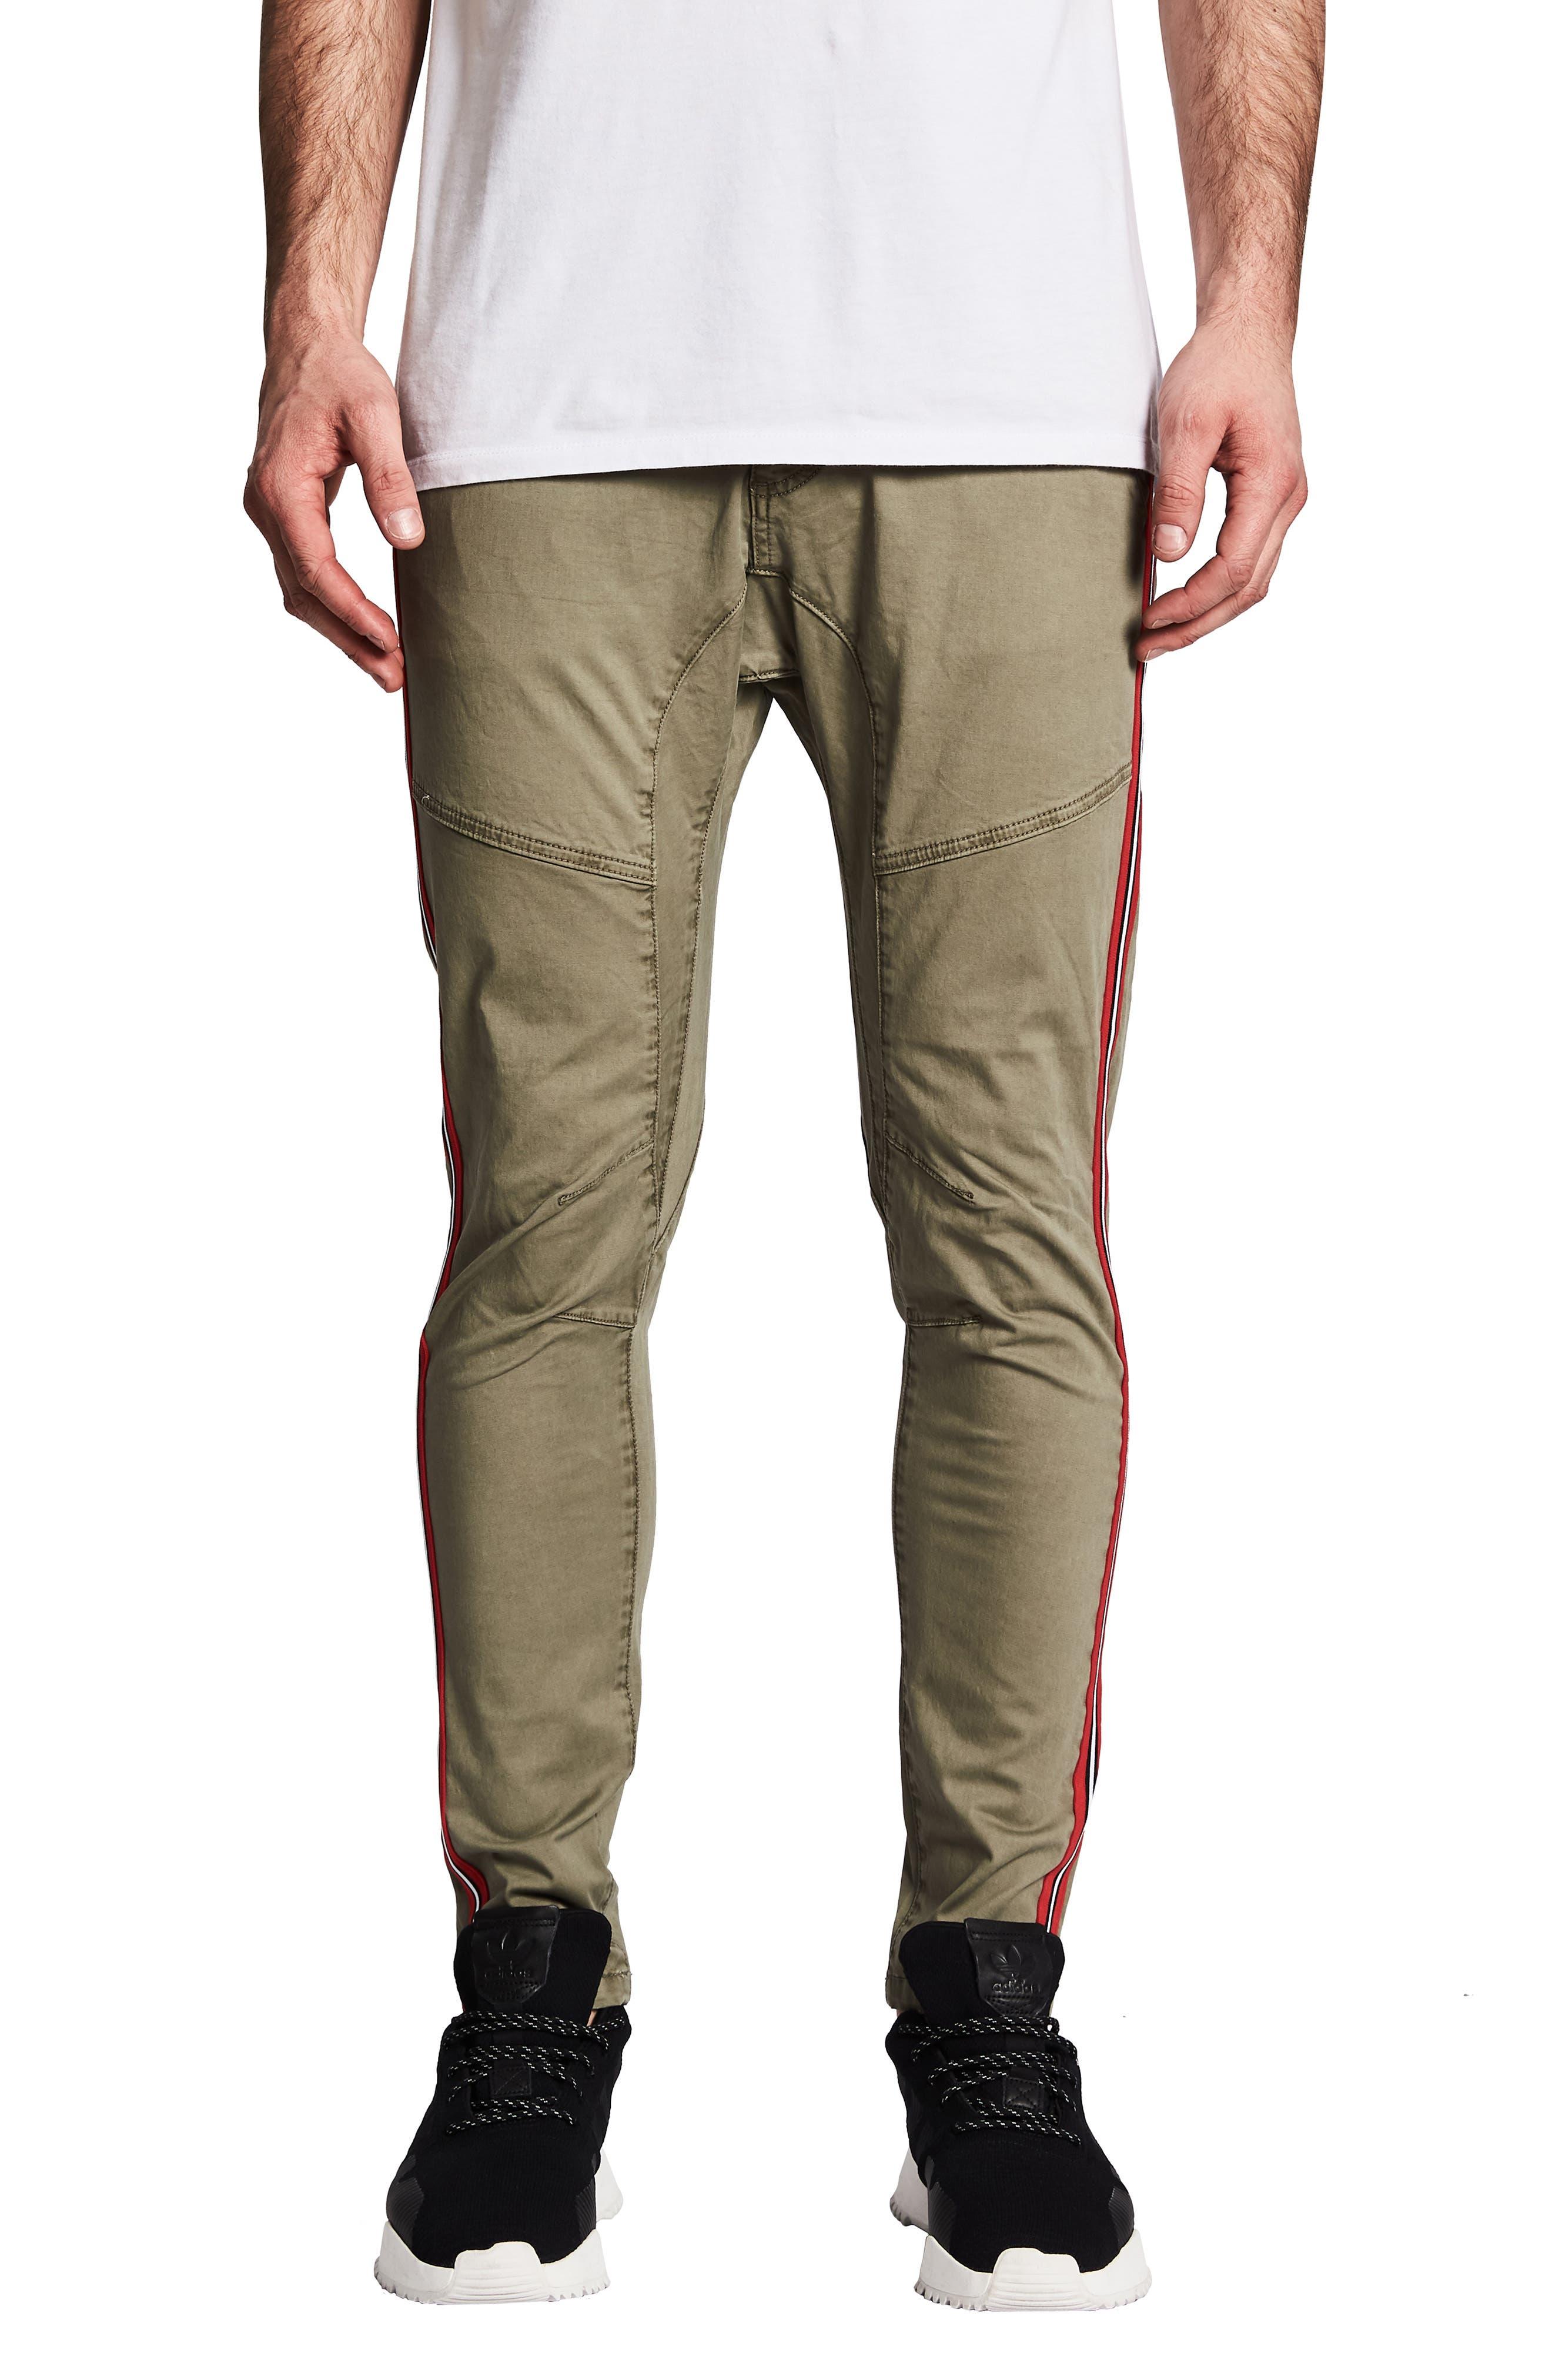 Nxp Baseline Twill Slim Fit Pants